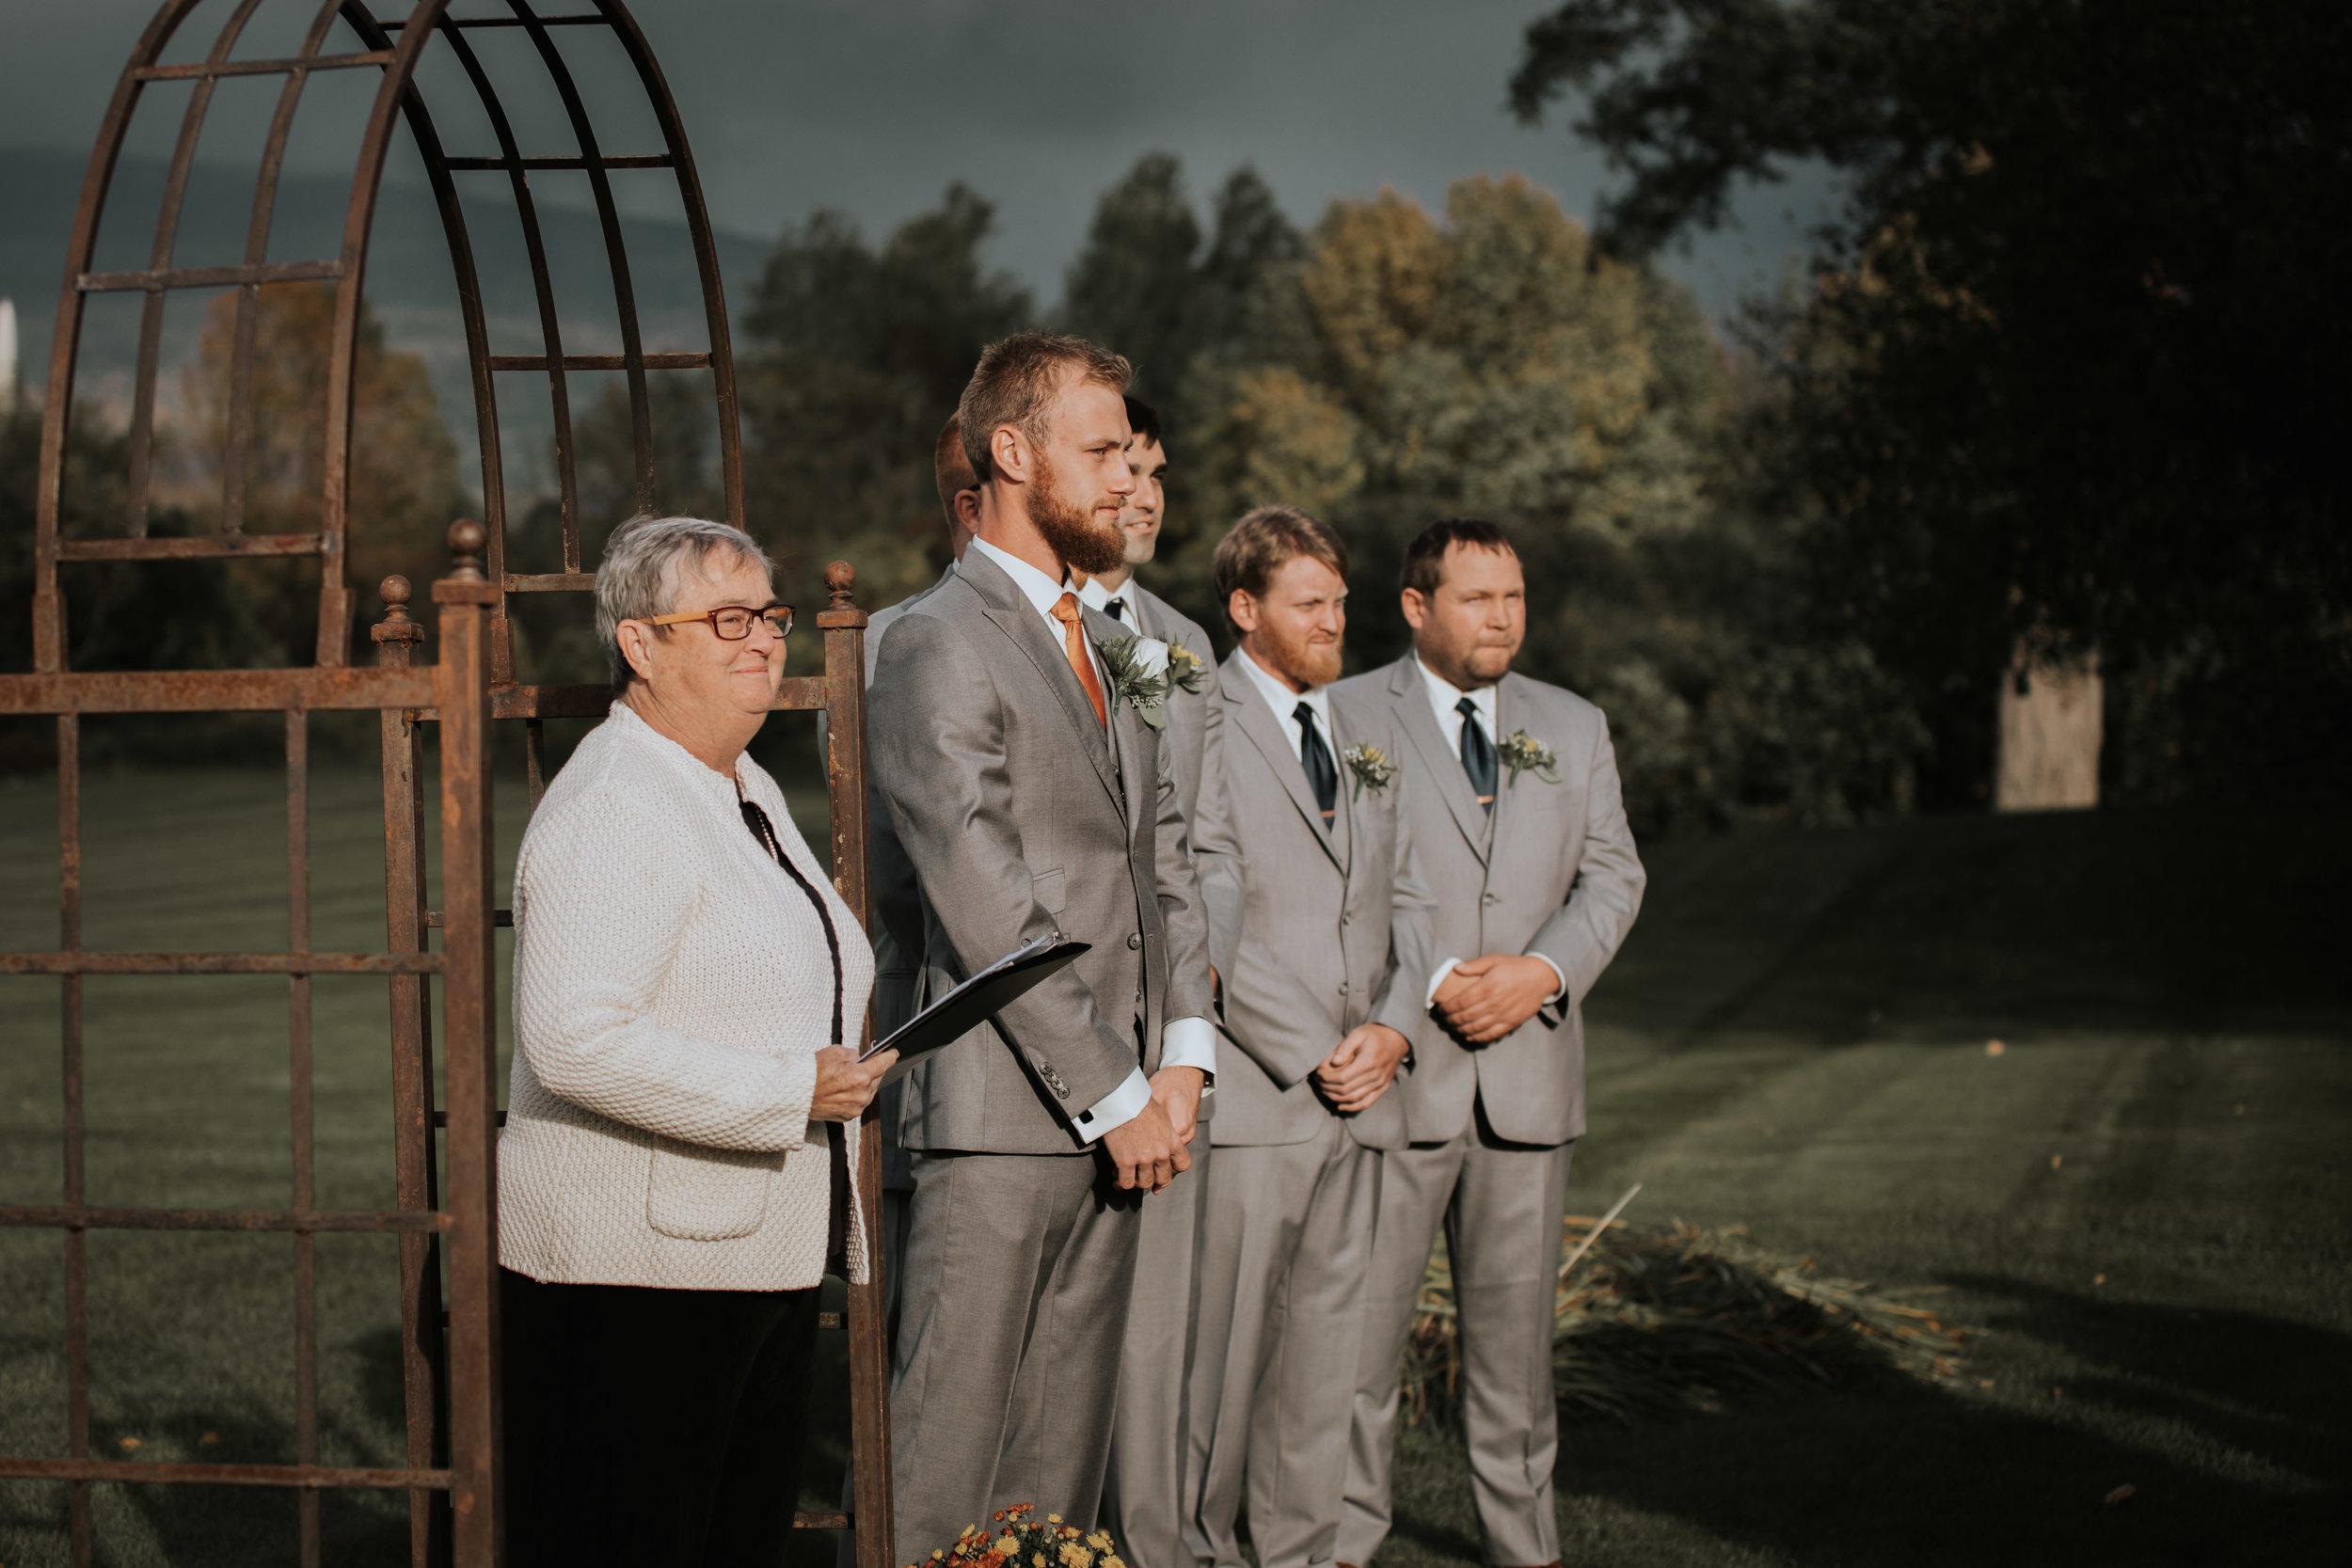 Vermont Wedding | Lorianna Weathers Photography-0487.jpg